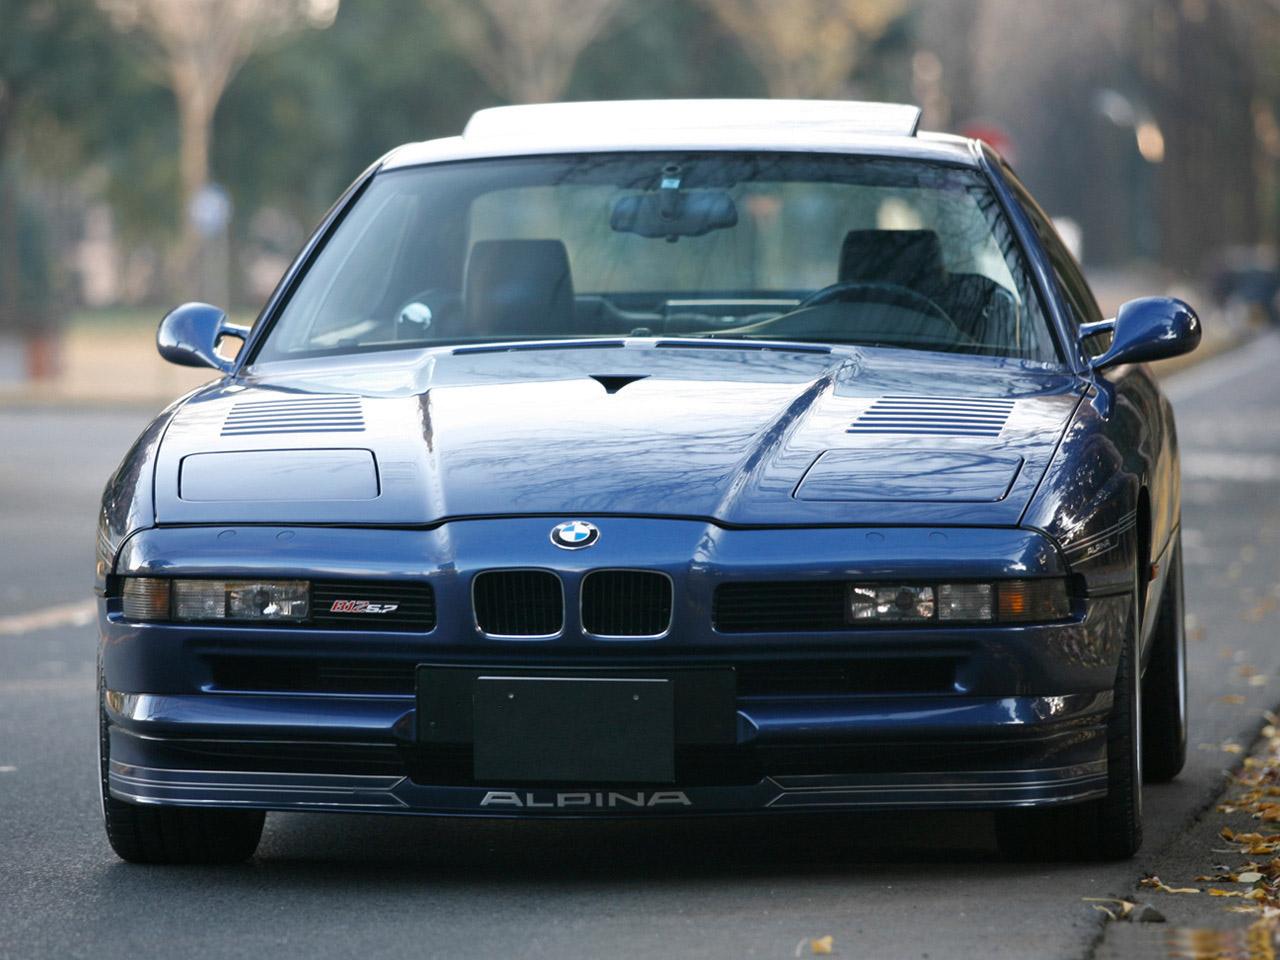 Alpina B12 E31 1990 - 1996 Coupe-Hardtop #4